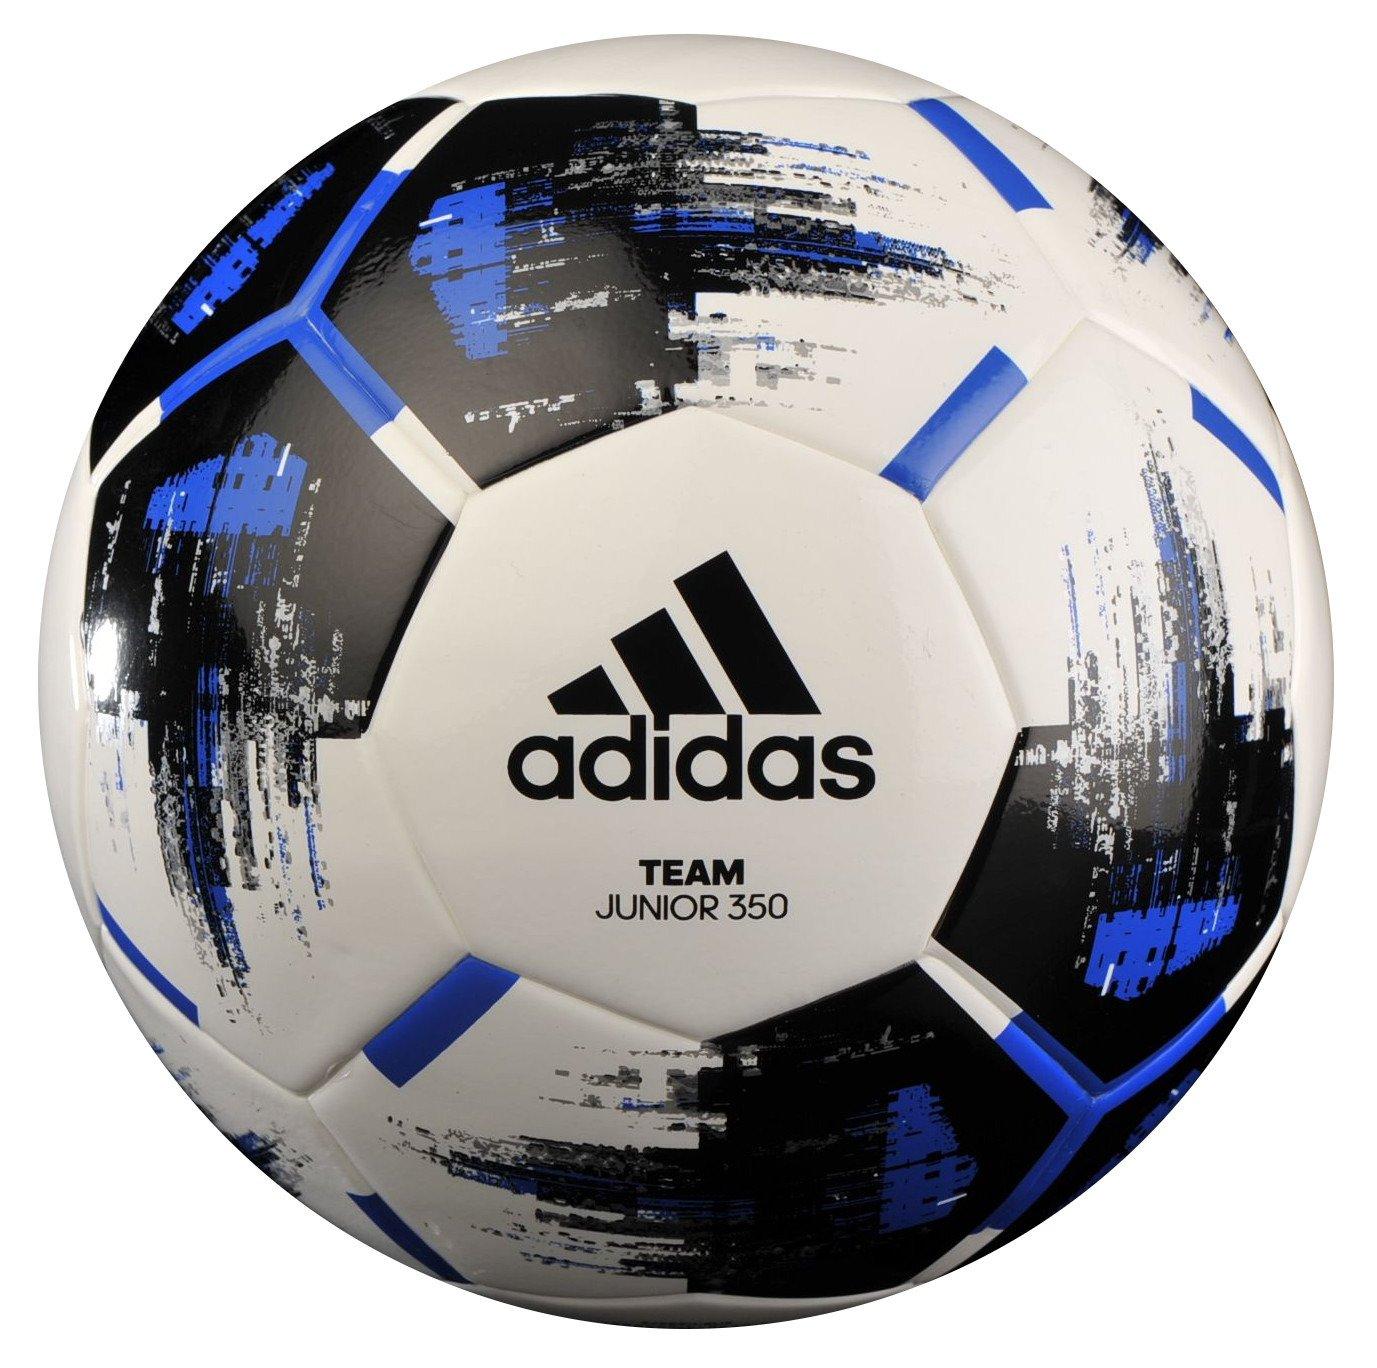 pilka-nozna-adidas-team-j350-cz9573-pilka-nozna-adidas-team-j350-cz.jpg